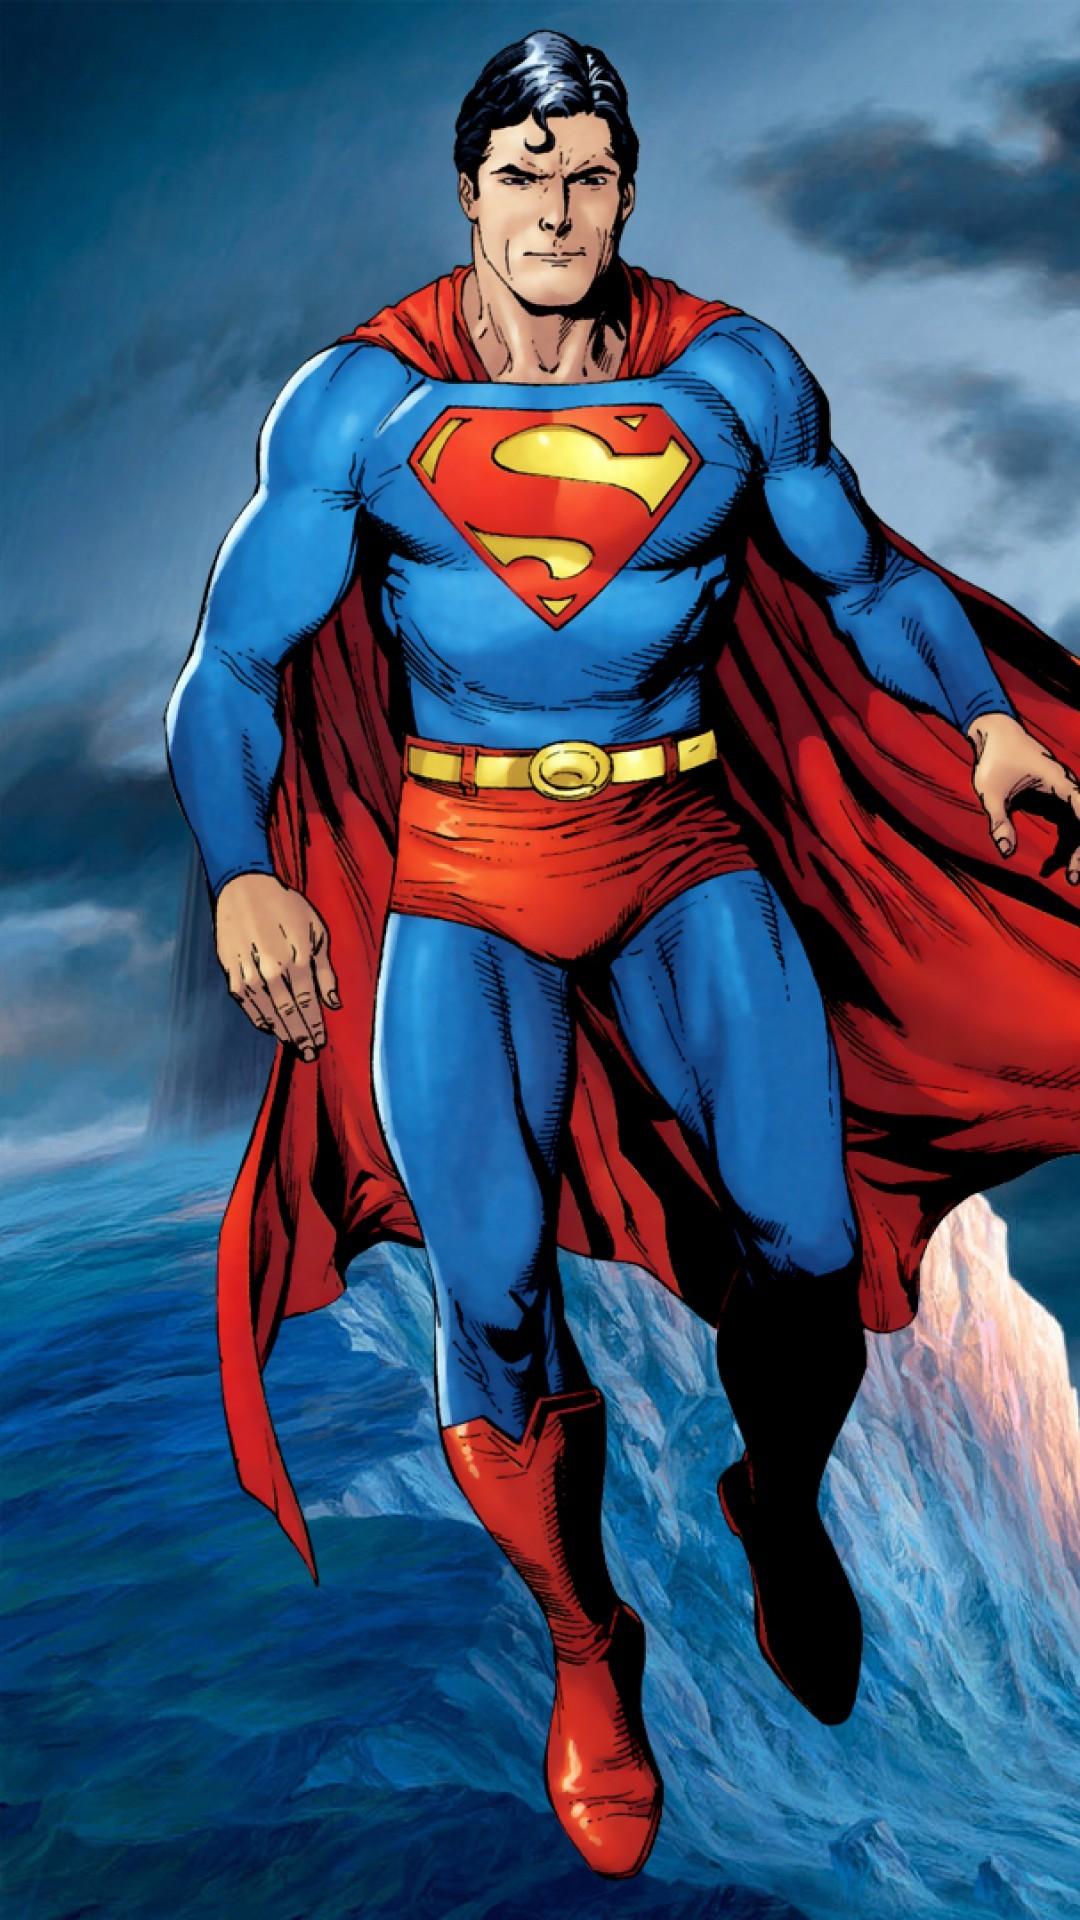 Superman Iphone Wallpaper #supermaniphonewallpaper